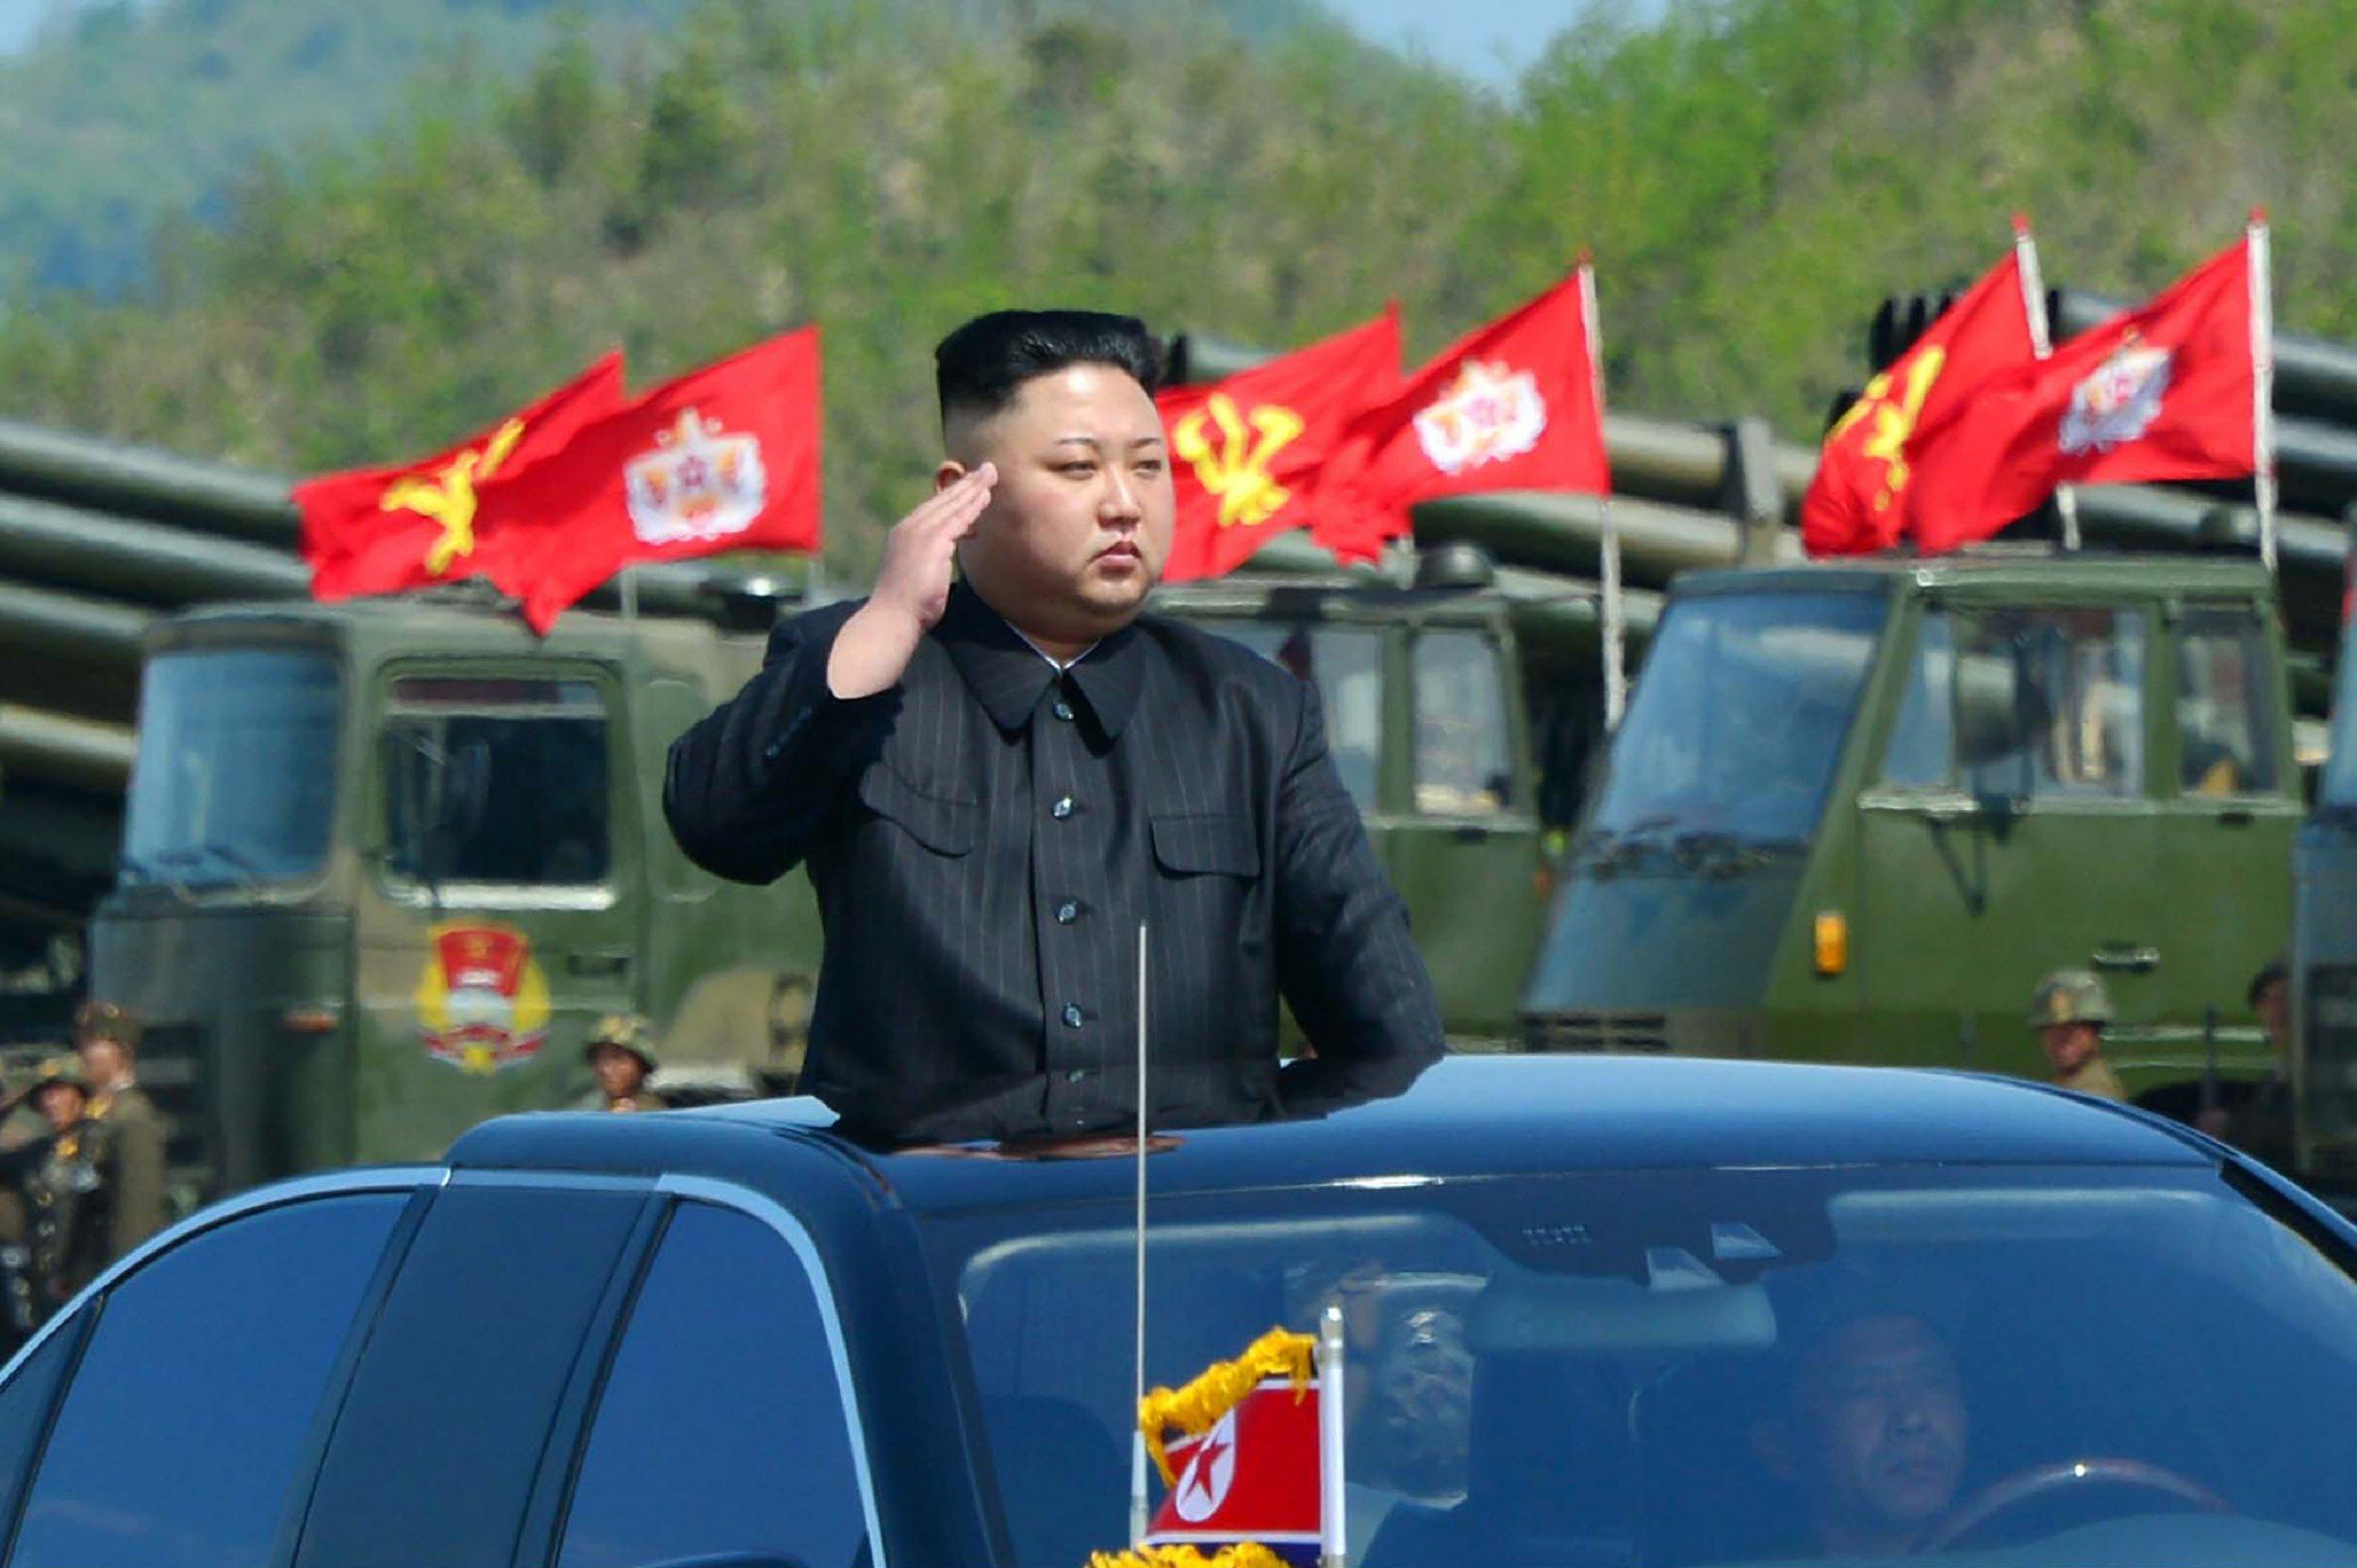 12_15_Ukraine_Syria_North_Korea_war